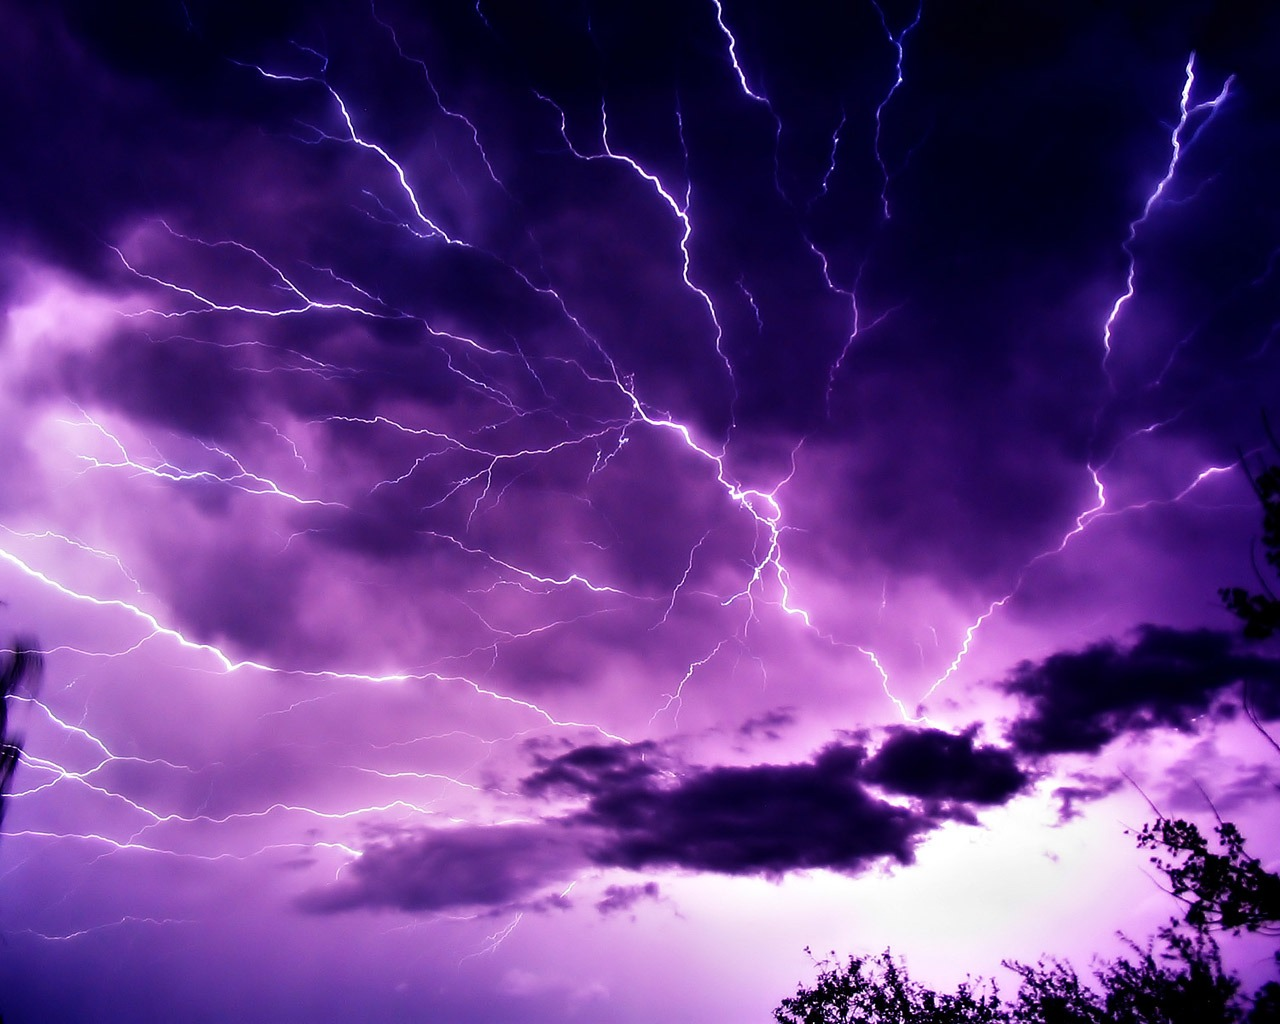 http://4.bp.blogspot.com/-8_J1pBhB2nU/TdOp7JtWTHI/AAAAAAAAEJM/ksWayKYpBwk/s1600/mauve_sky_with_lightning_wallpaper_landscape_nature_wallpaper_1280_1024_1528.jpg